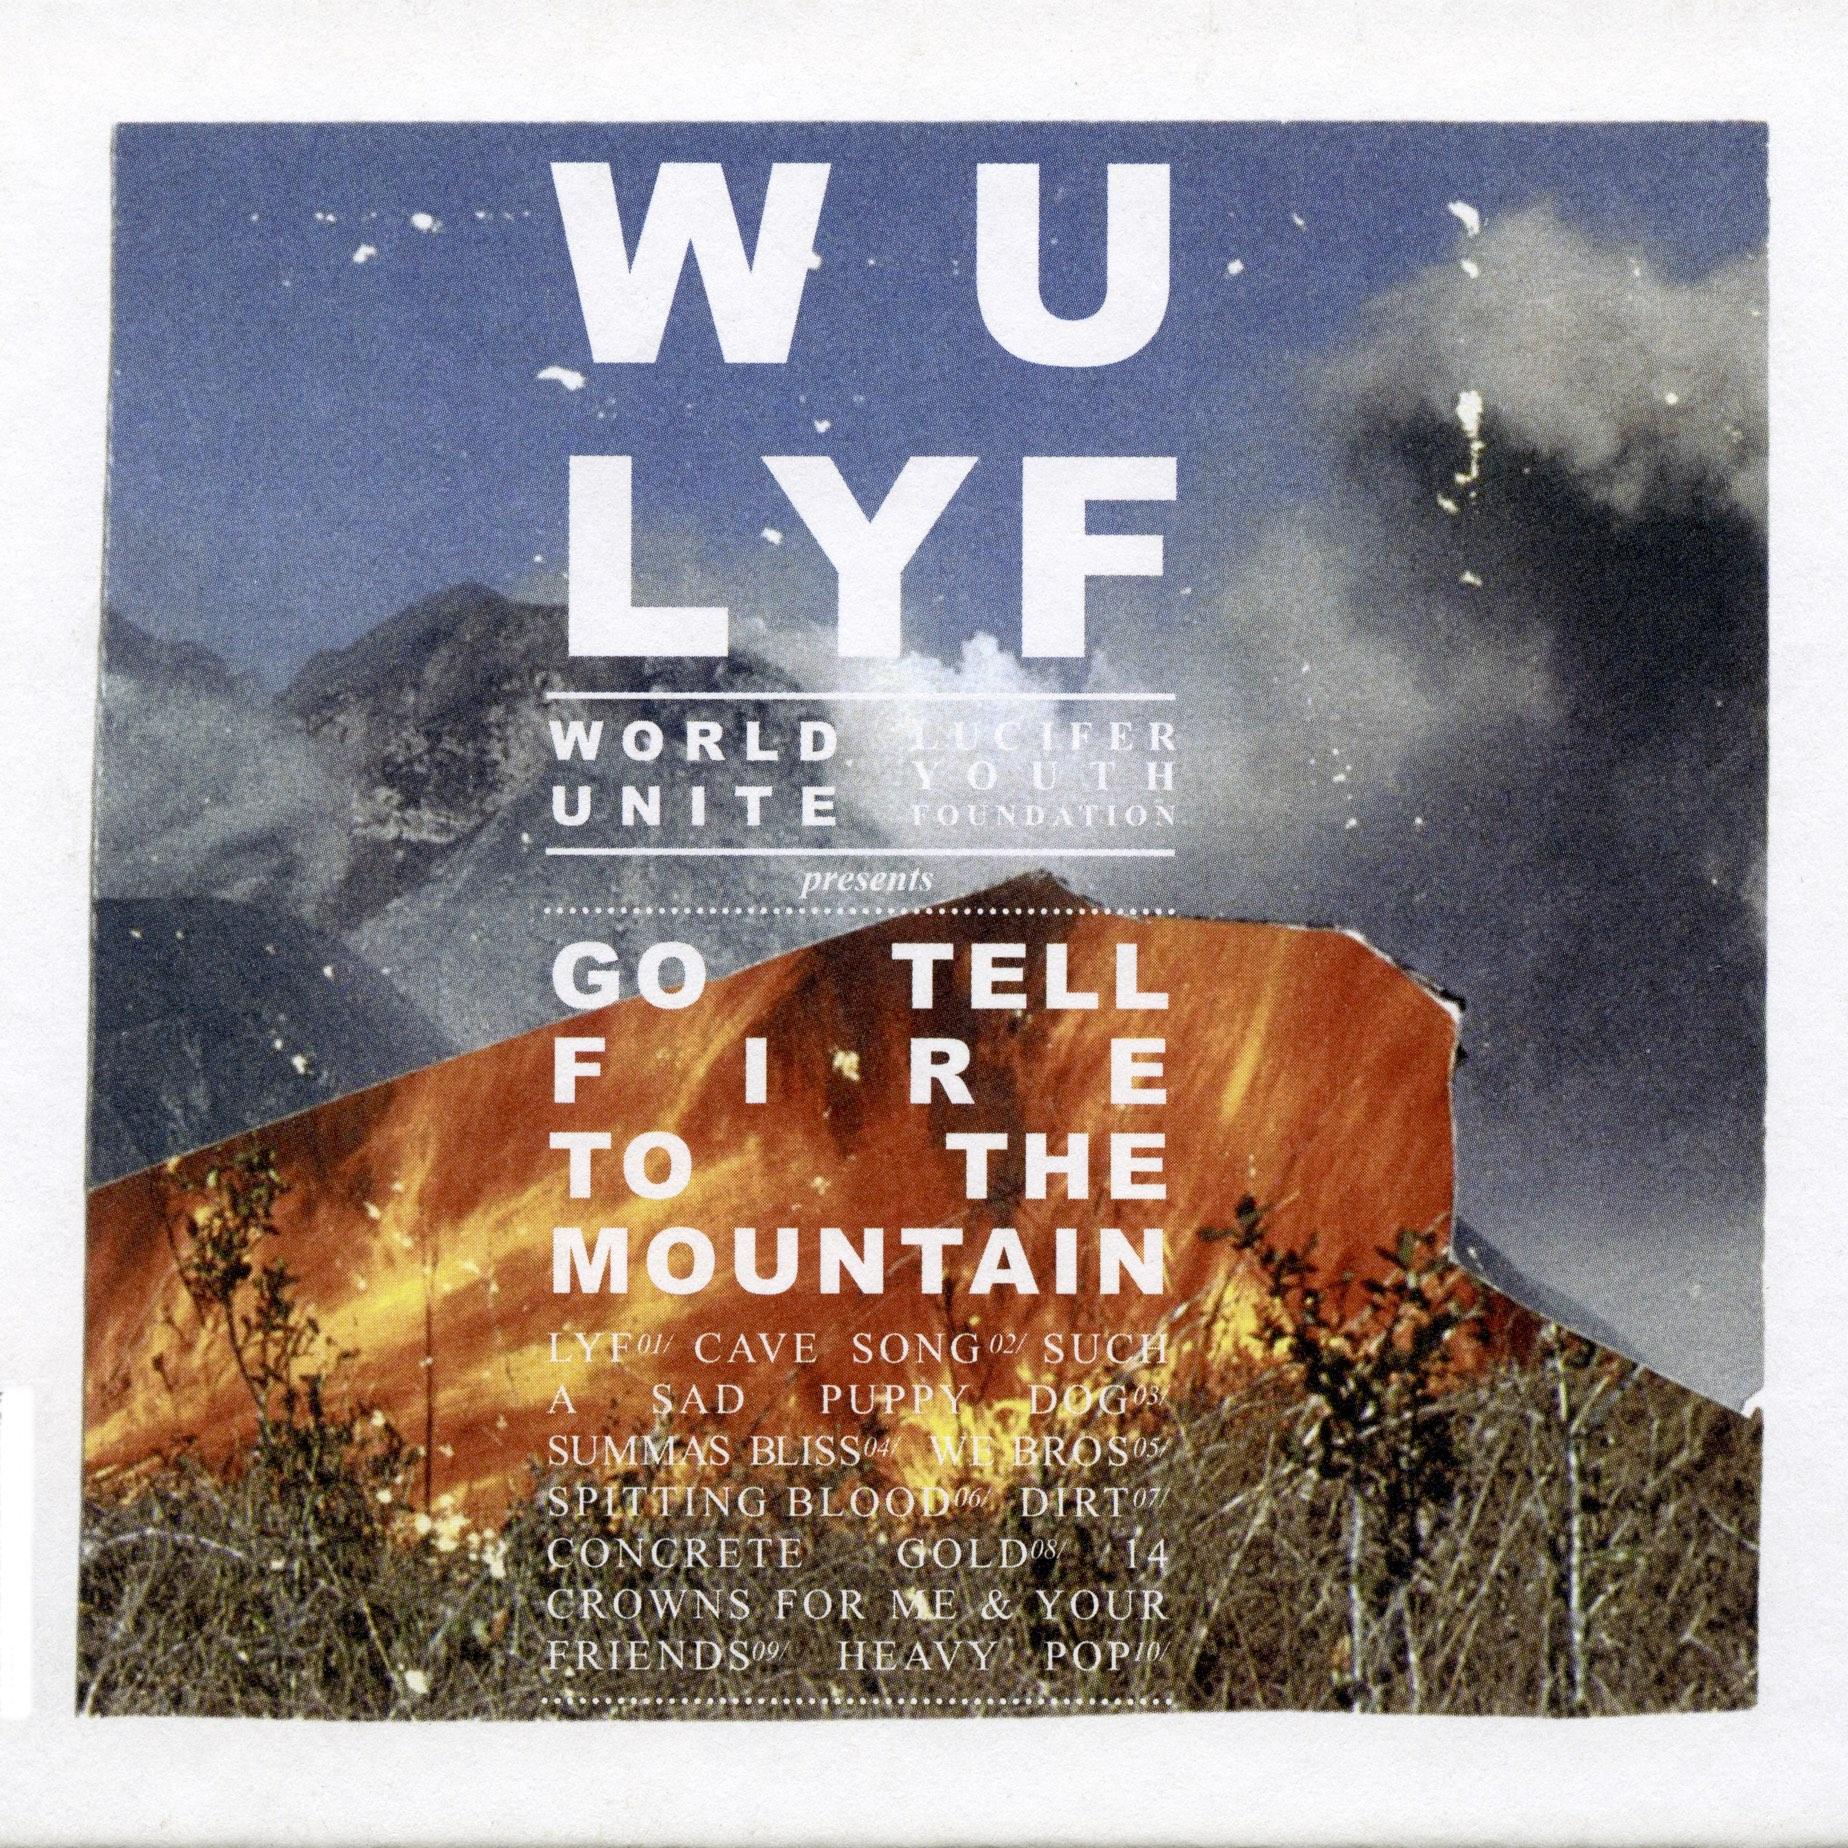 2010 - Wu Lyf